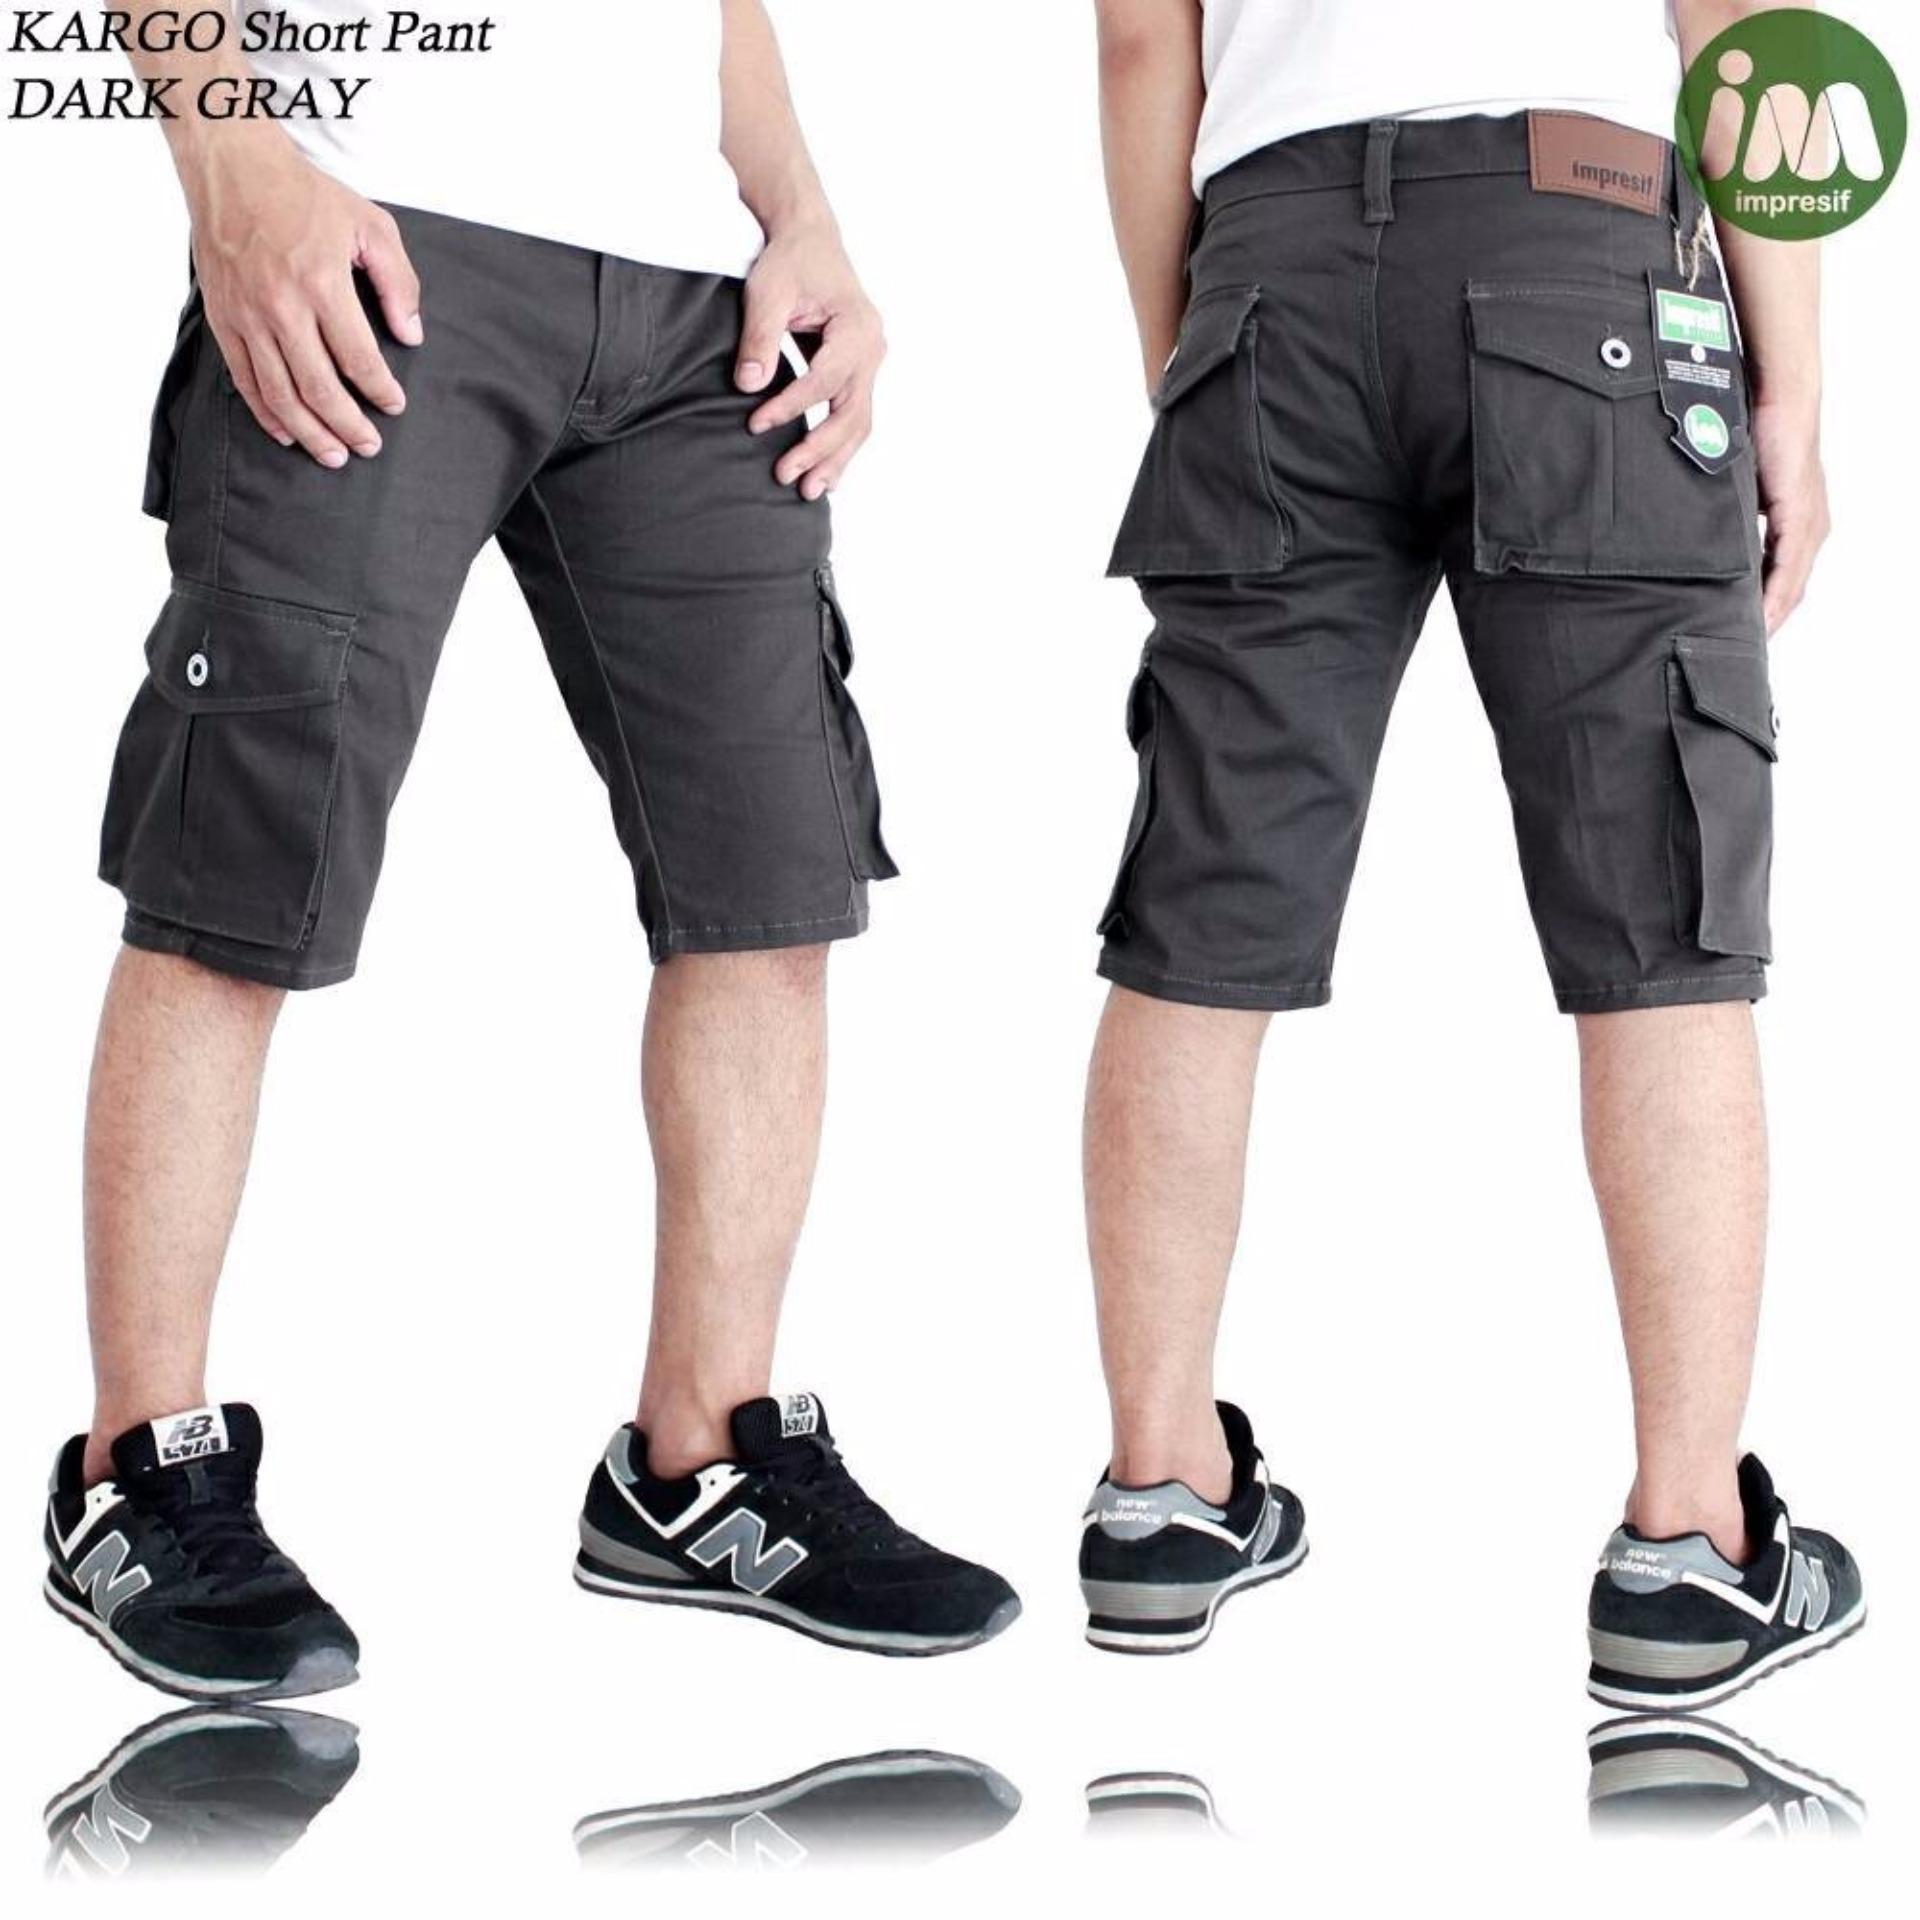 Celana Cargo Pendek Pria Tactical Mode / Celana Pendek Pria Casual / Celana Santai Pria By Toko Erlangga Acc.